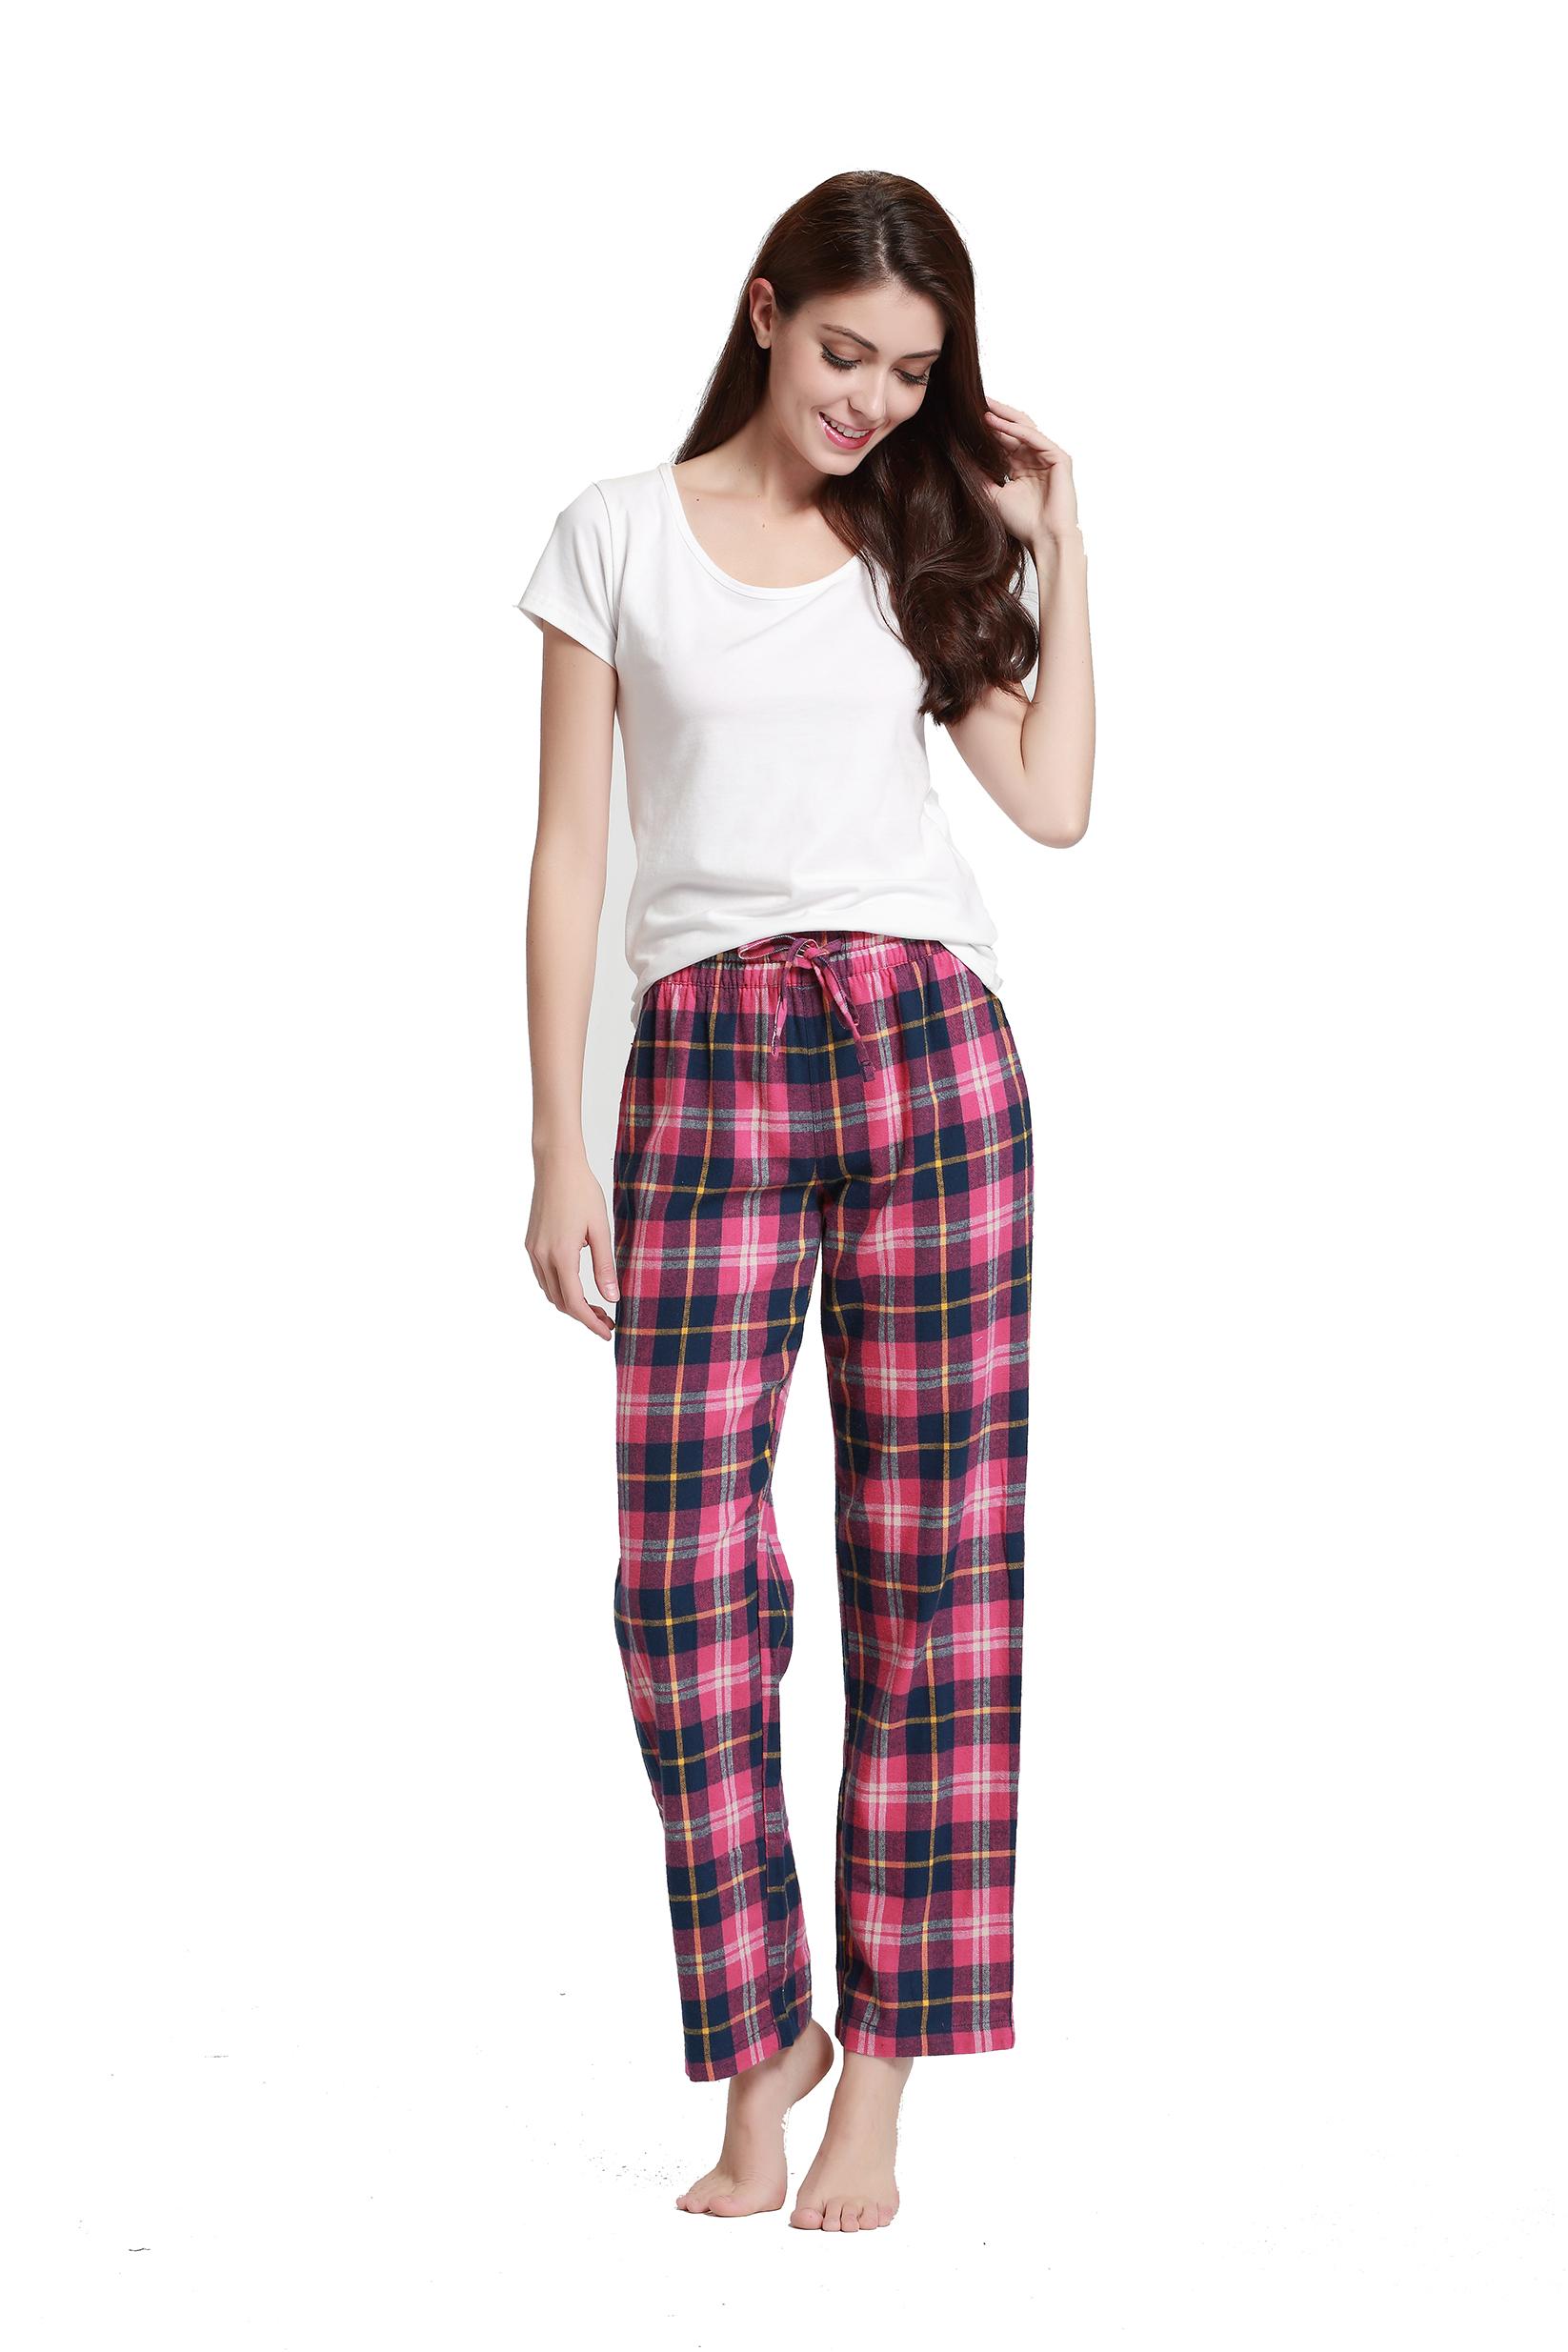 CYZ Women's 100% Cotton Flannel Pajama Pants - $8.99